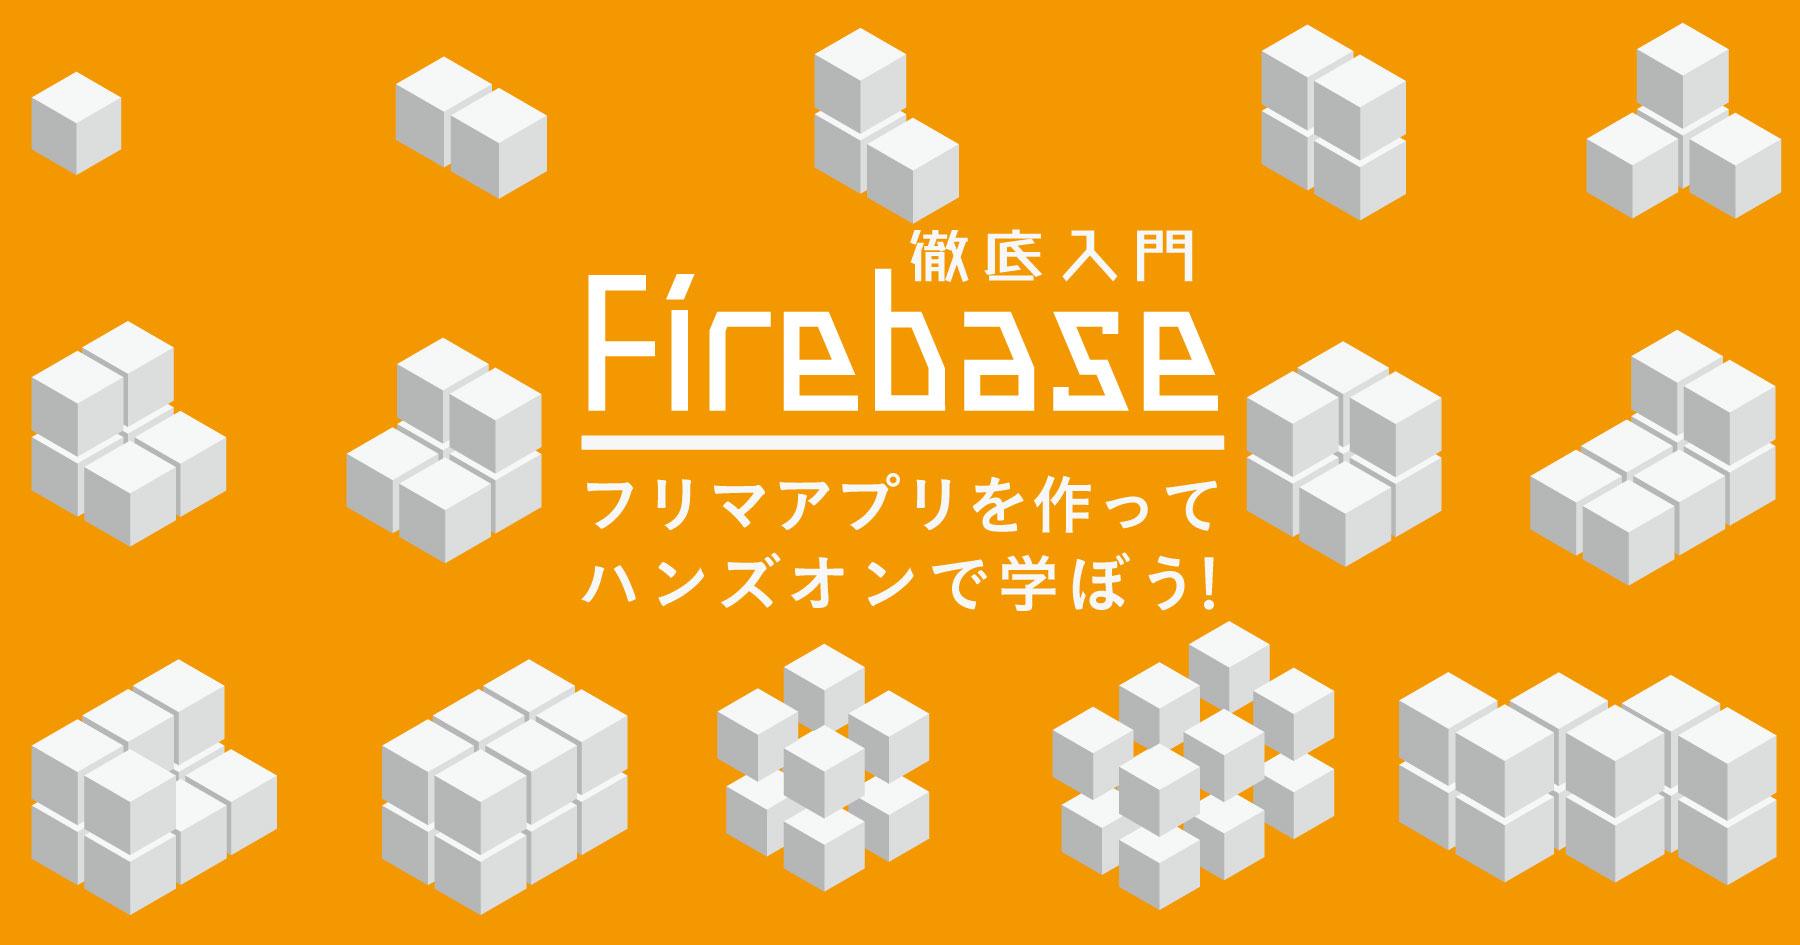 Firebase入門 フリマアプリを作りながら、認証・Firestore